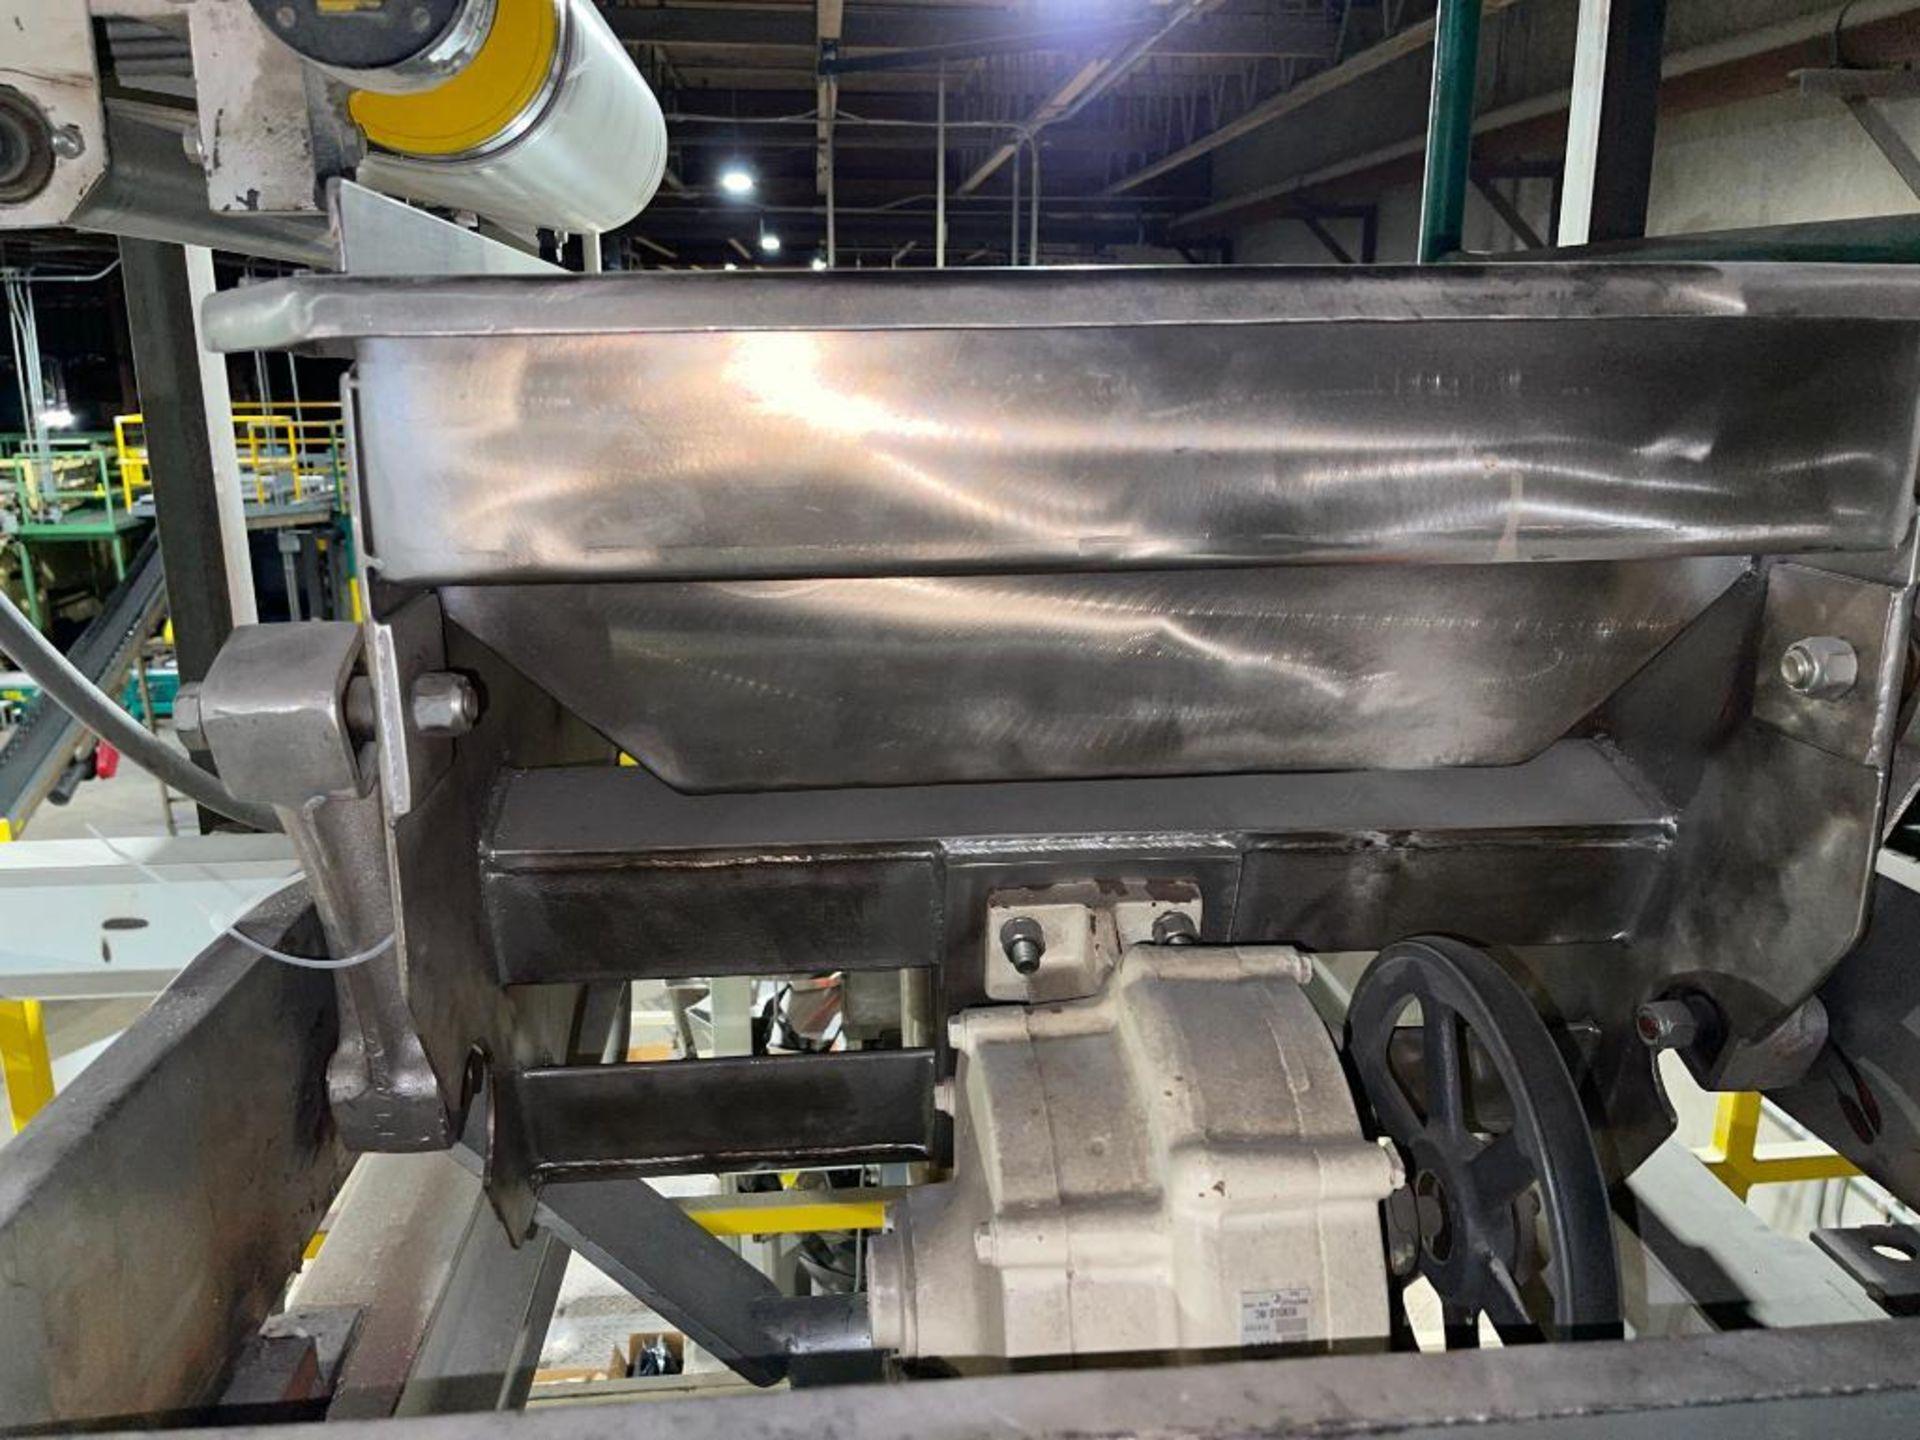 Eriez vibratory conveyor - Image 2 of 7